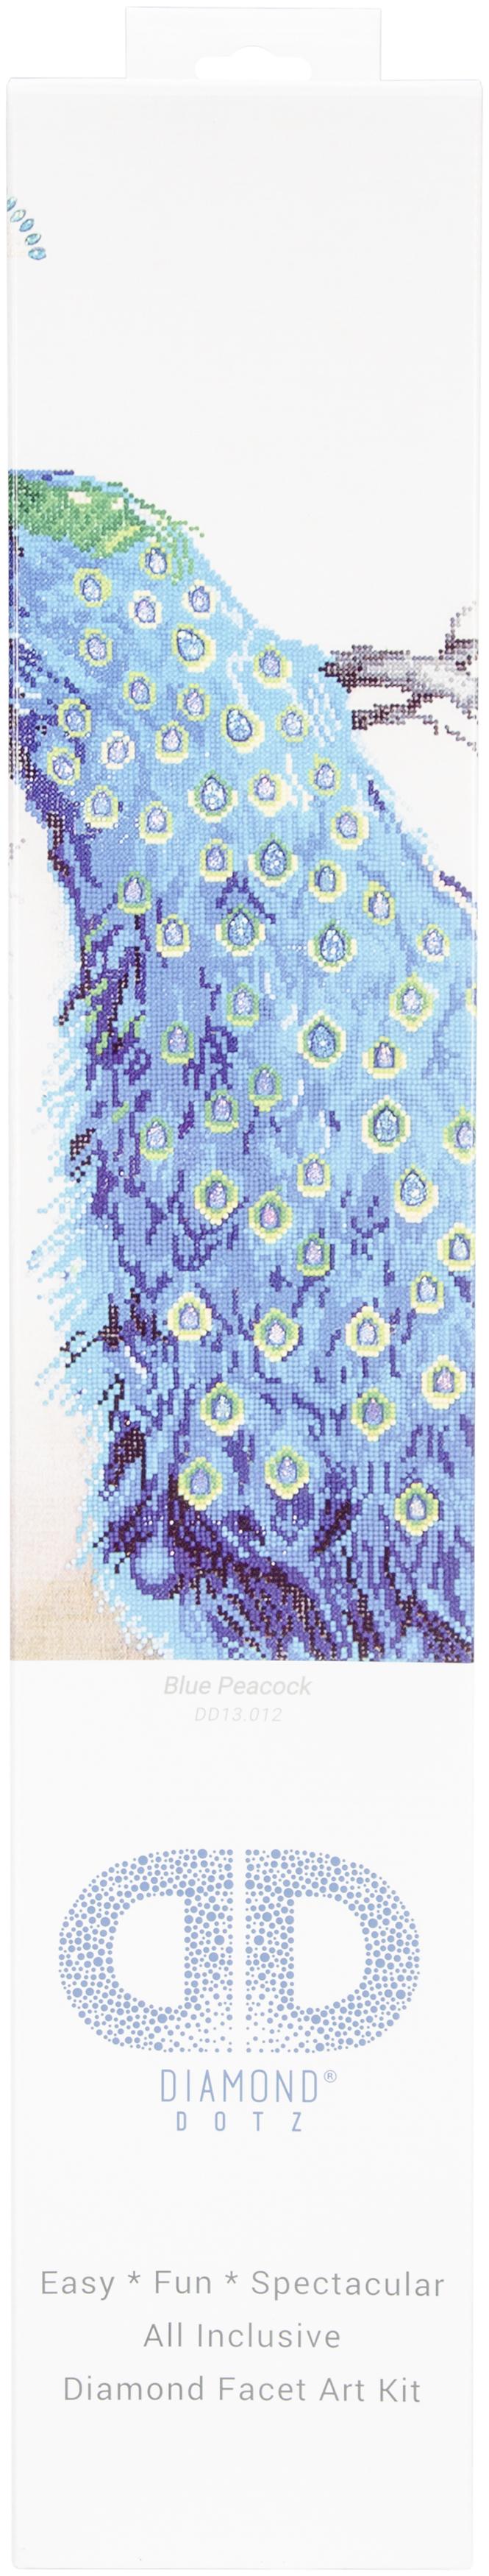 Diamond Dotz Diamond Embroidery Facet Art Kit 25.25X34.5-Blue Peacock